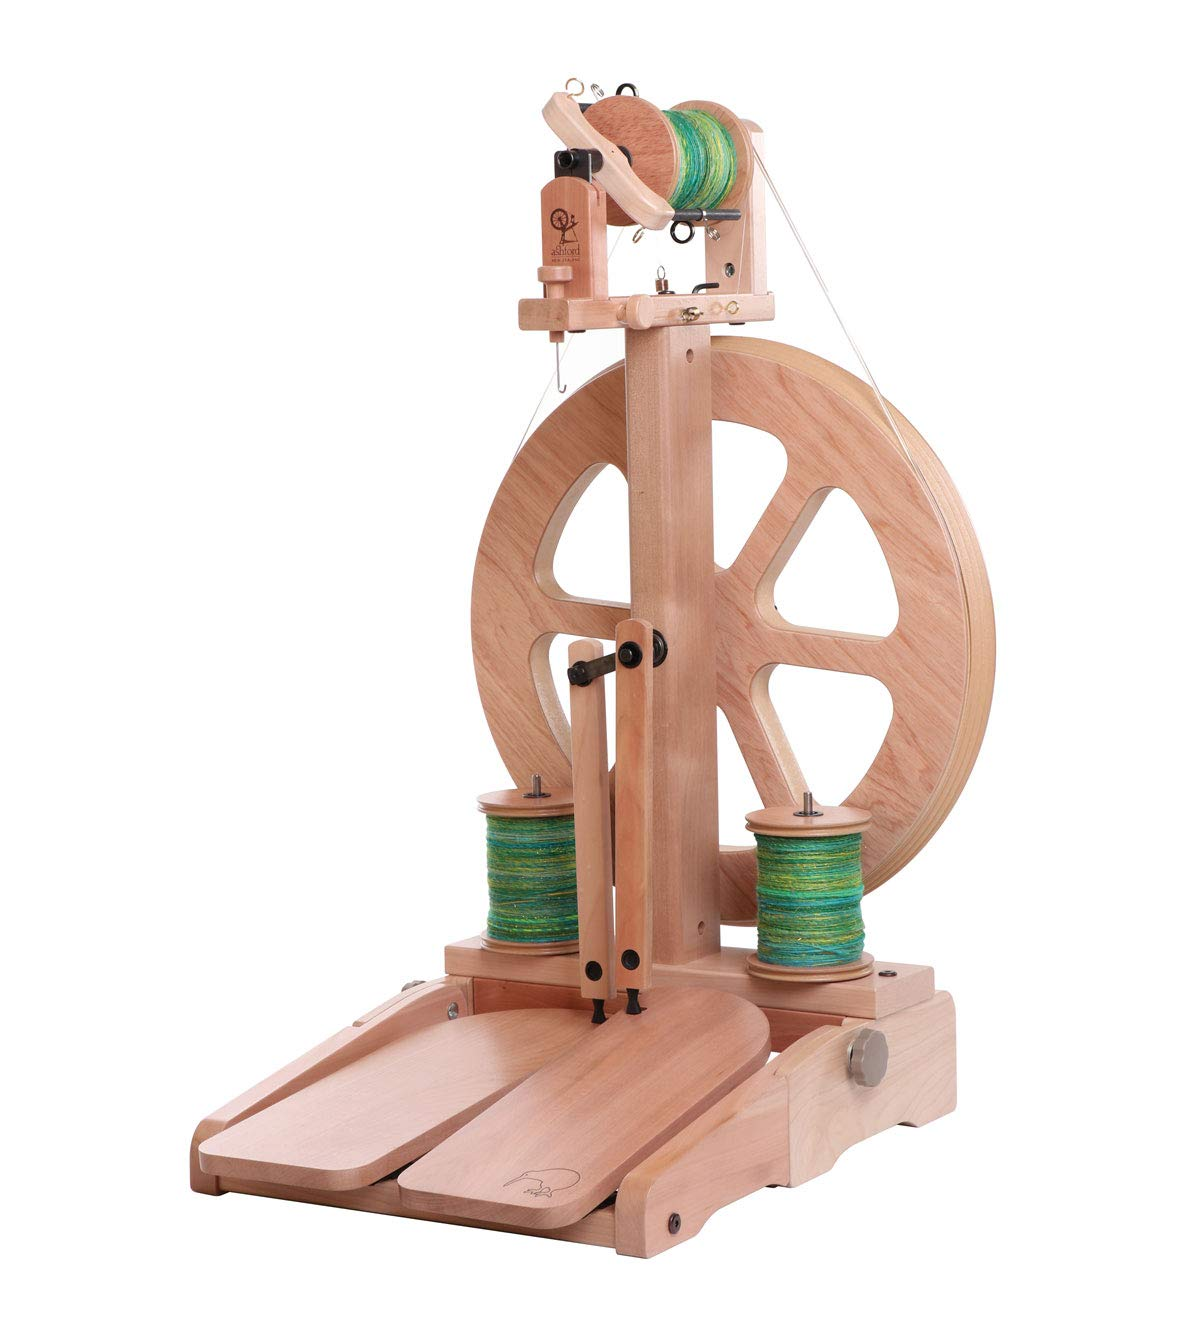 Ashford Kiwi Spinning Wheel 3 Unfinished Ashford Handicrafts